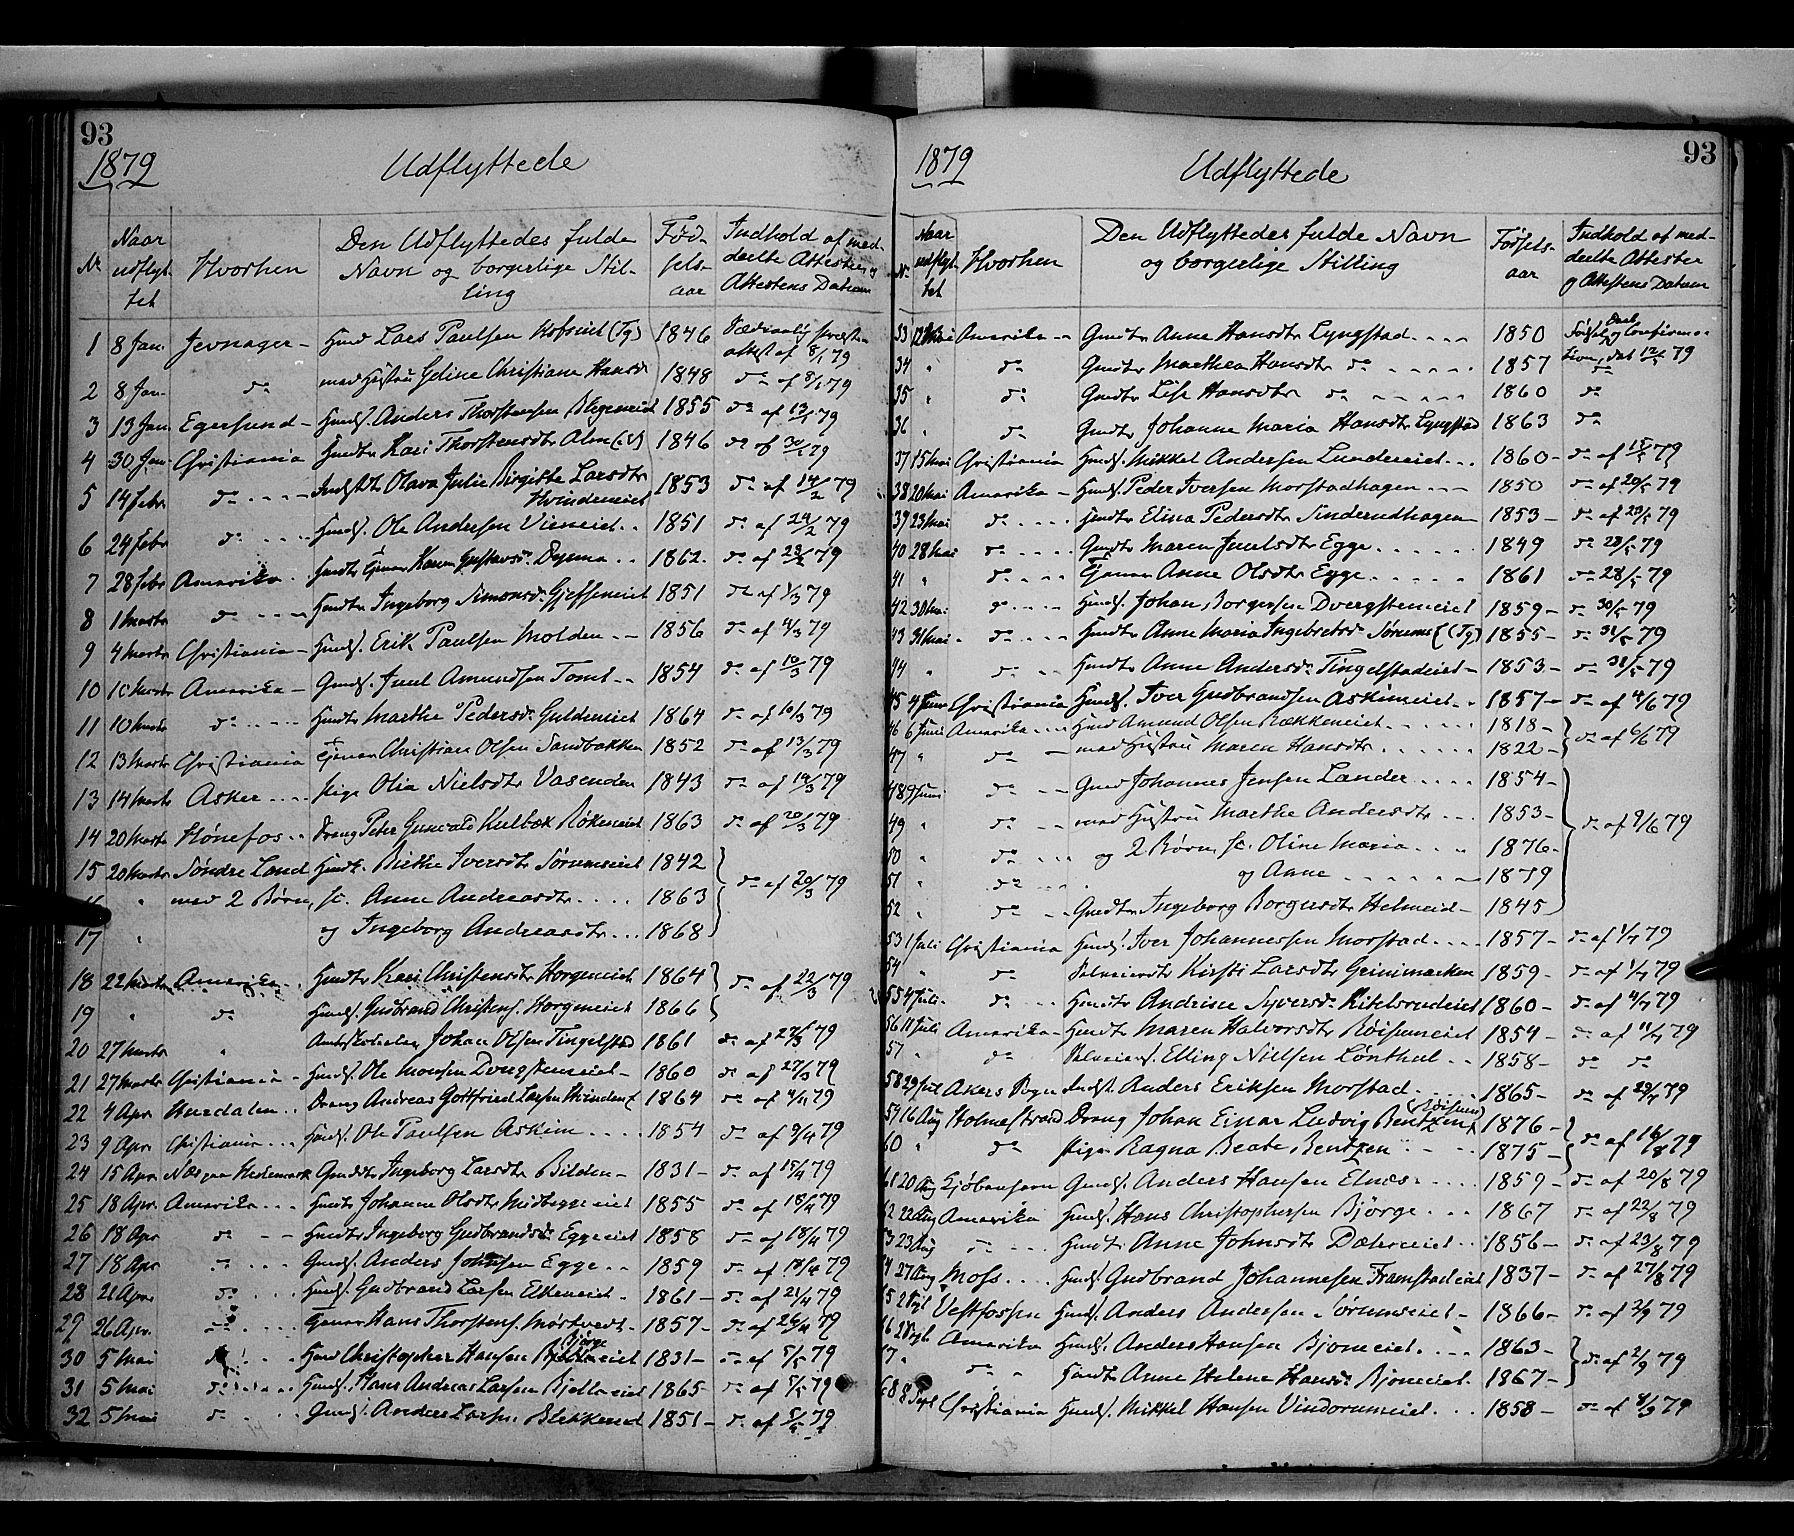 SAH, Gran prestekontor, Ministerialbok nr. 13, 1875-1879, s. 93